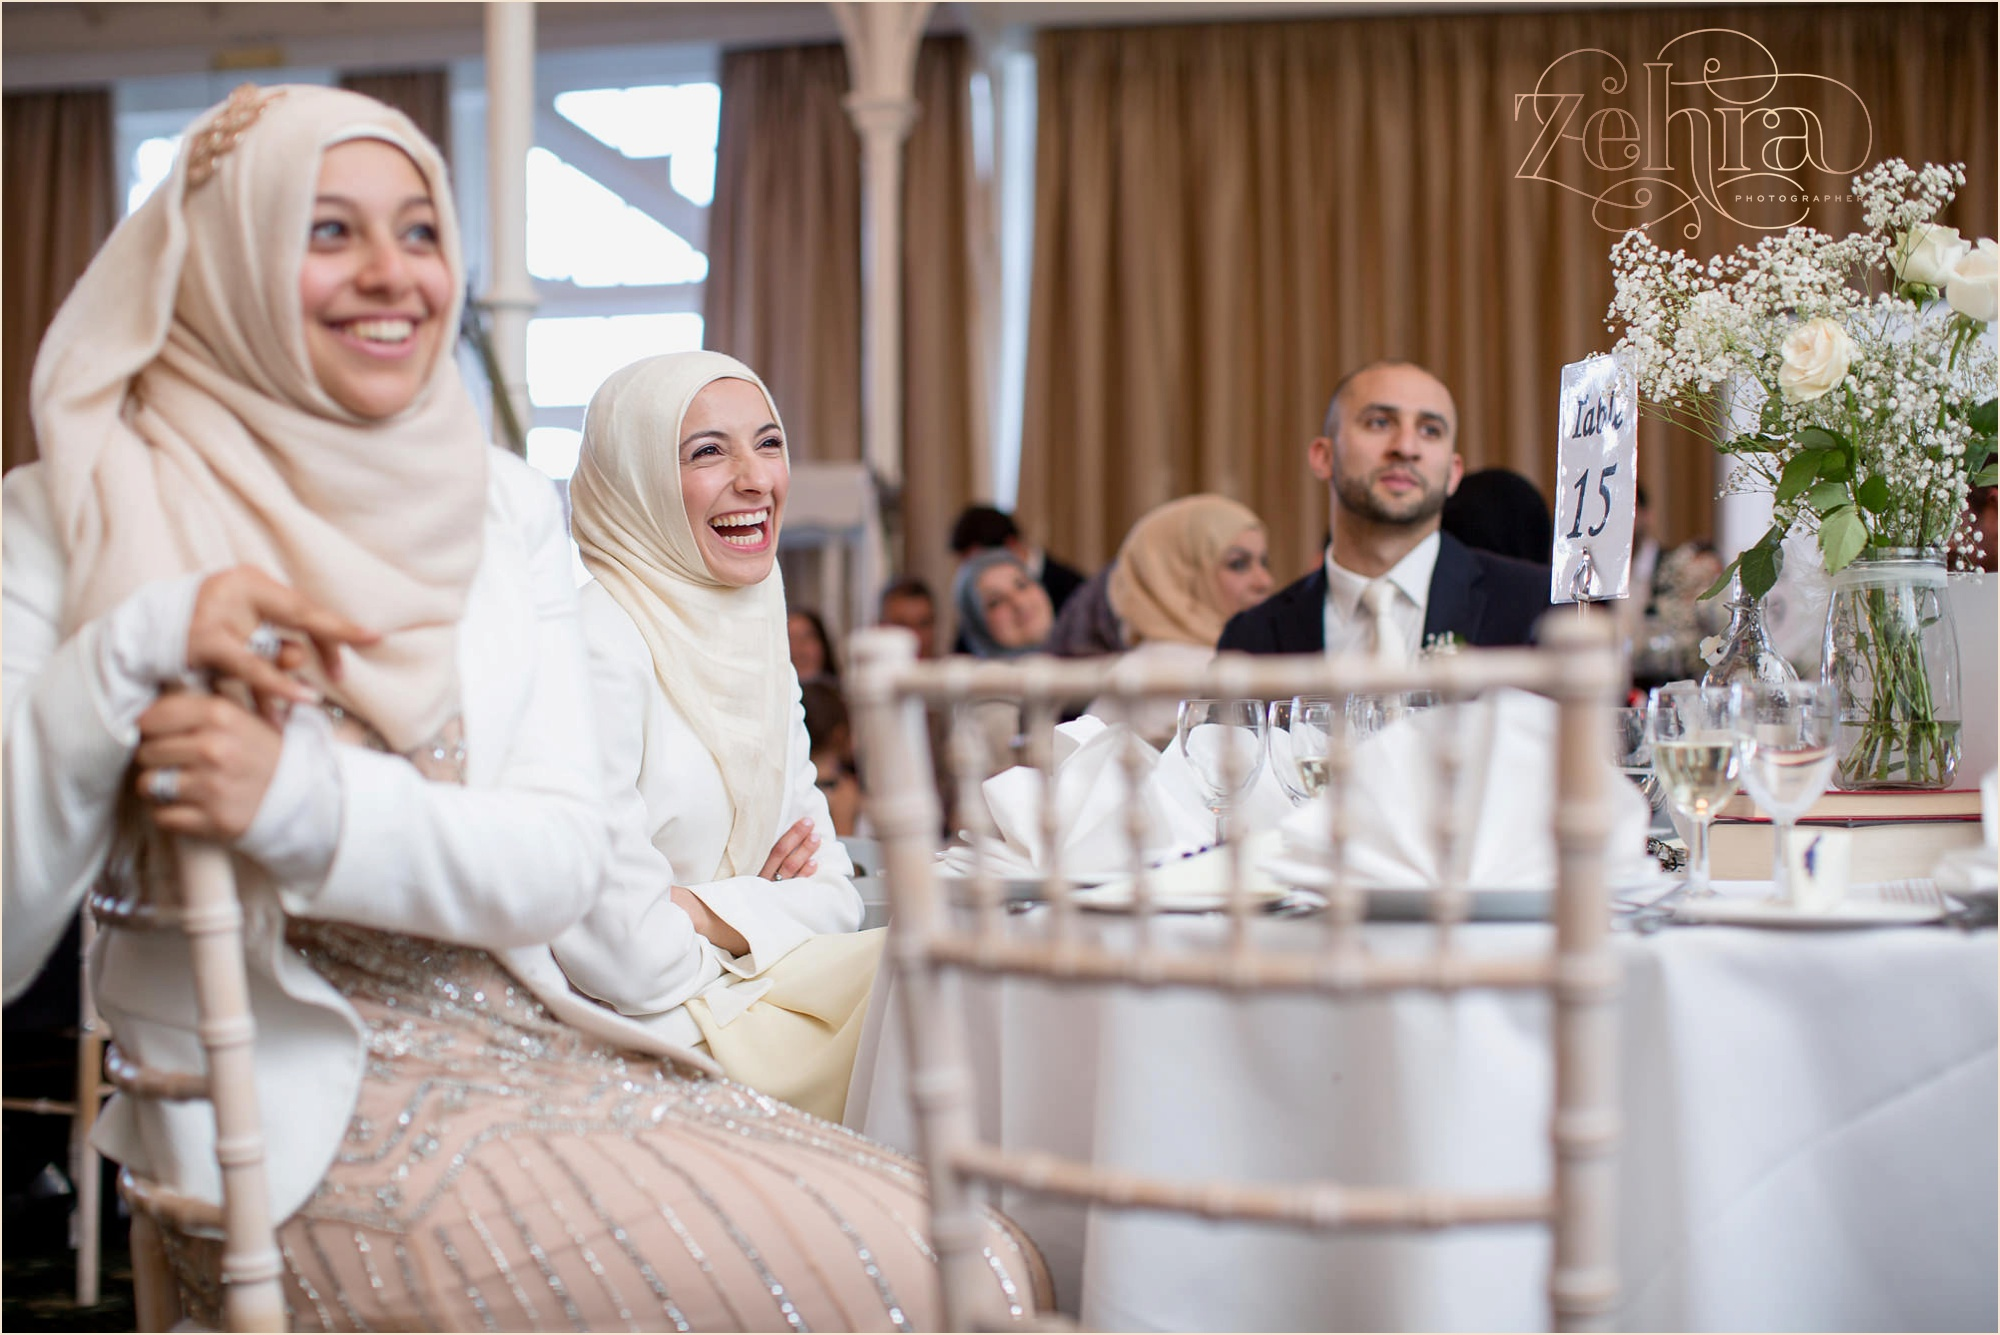 jasira manchester wedding photographer_0098.jpg